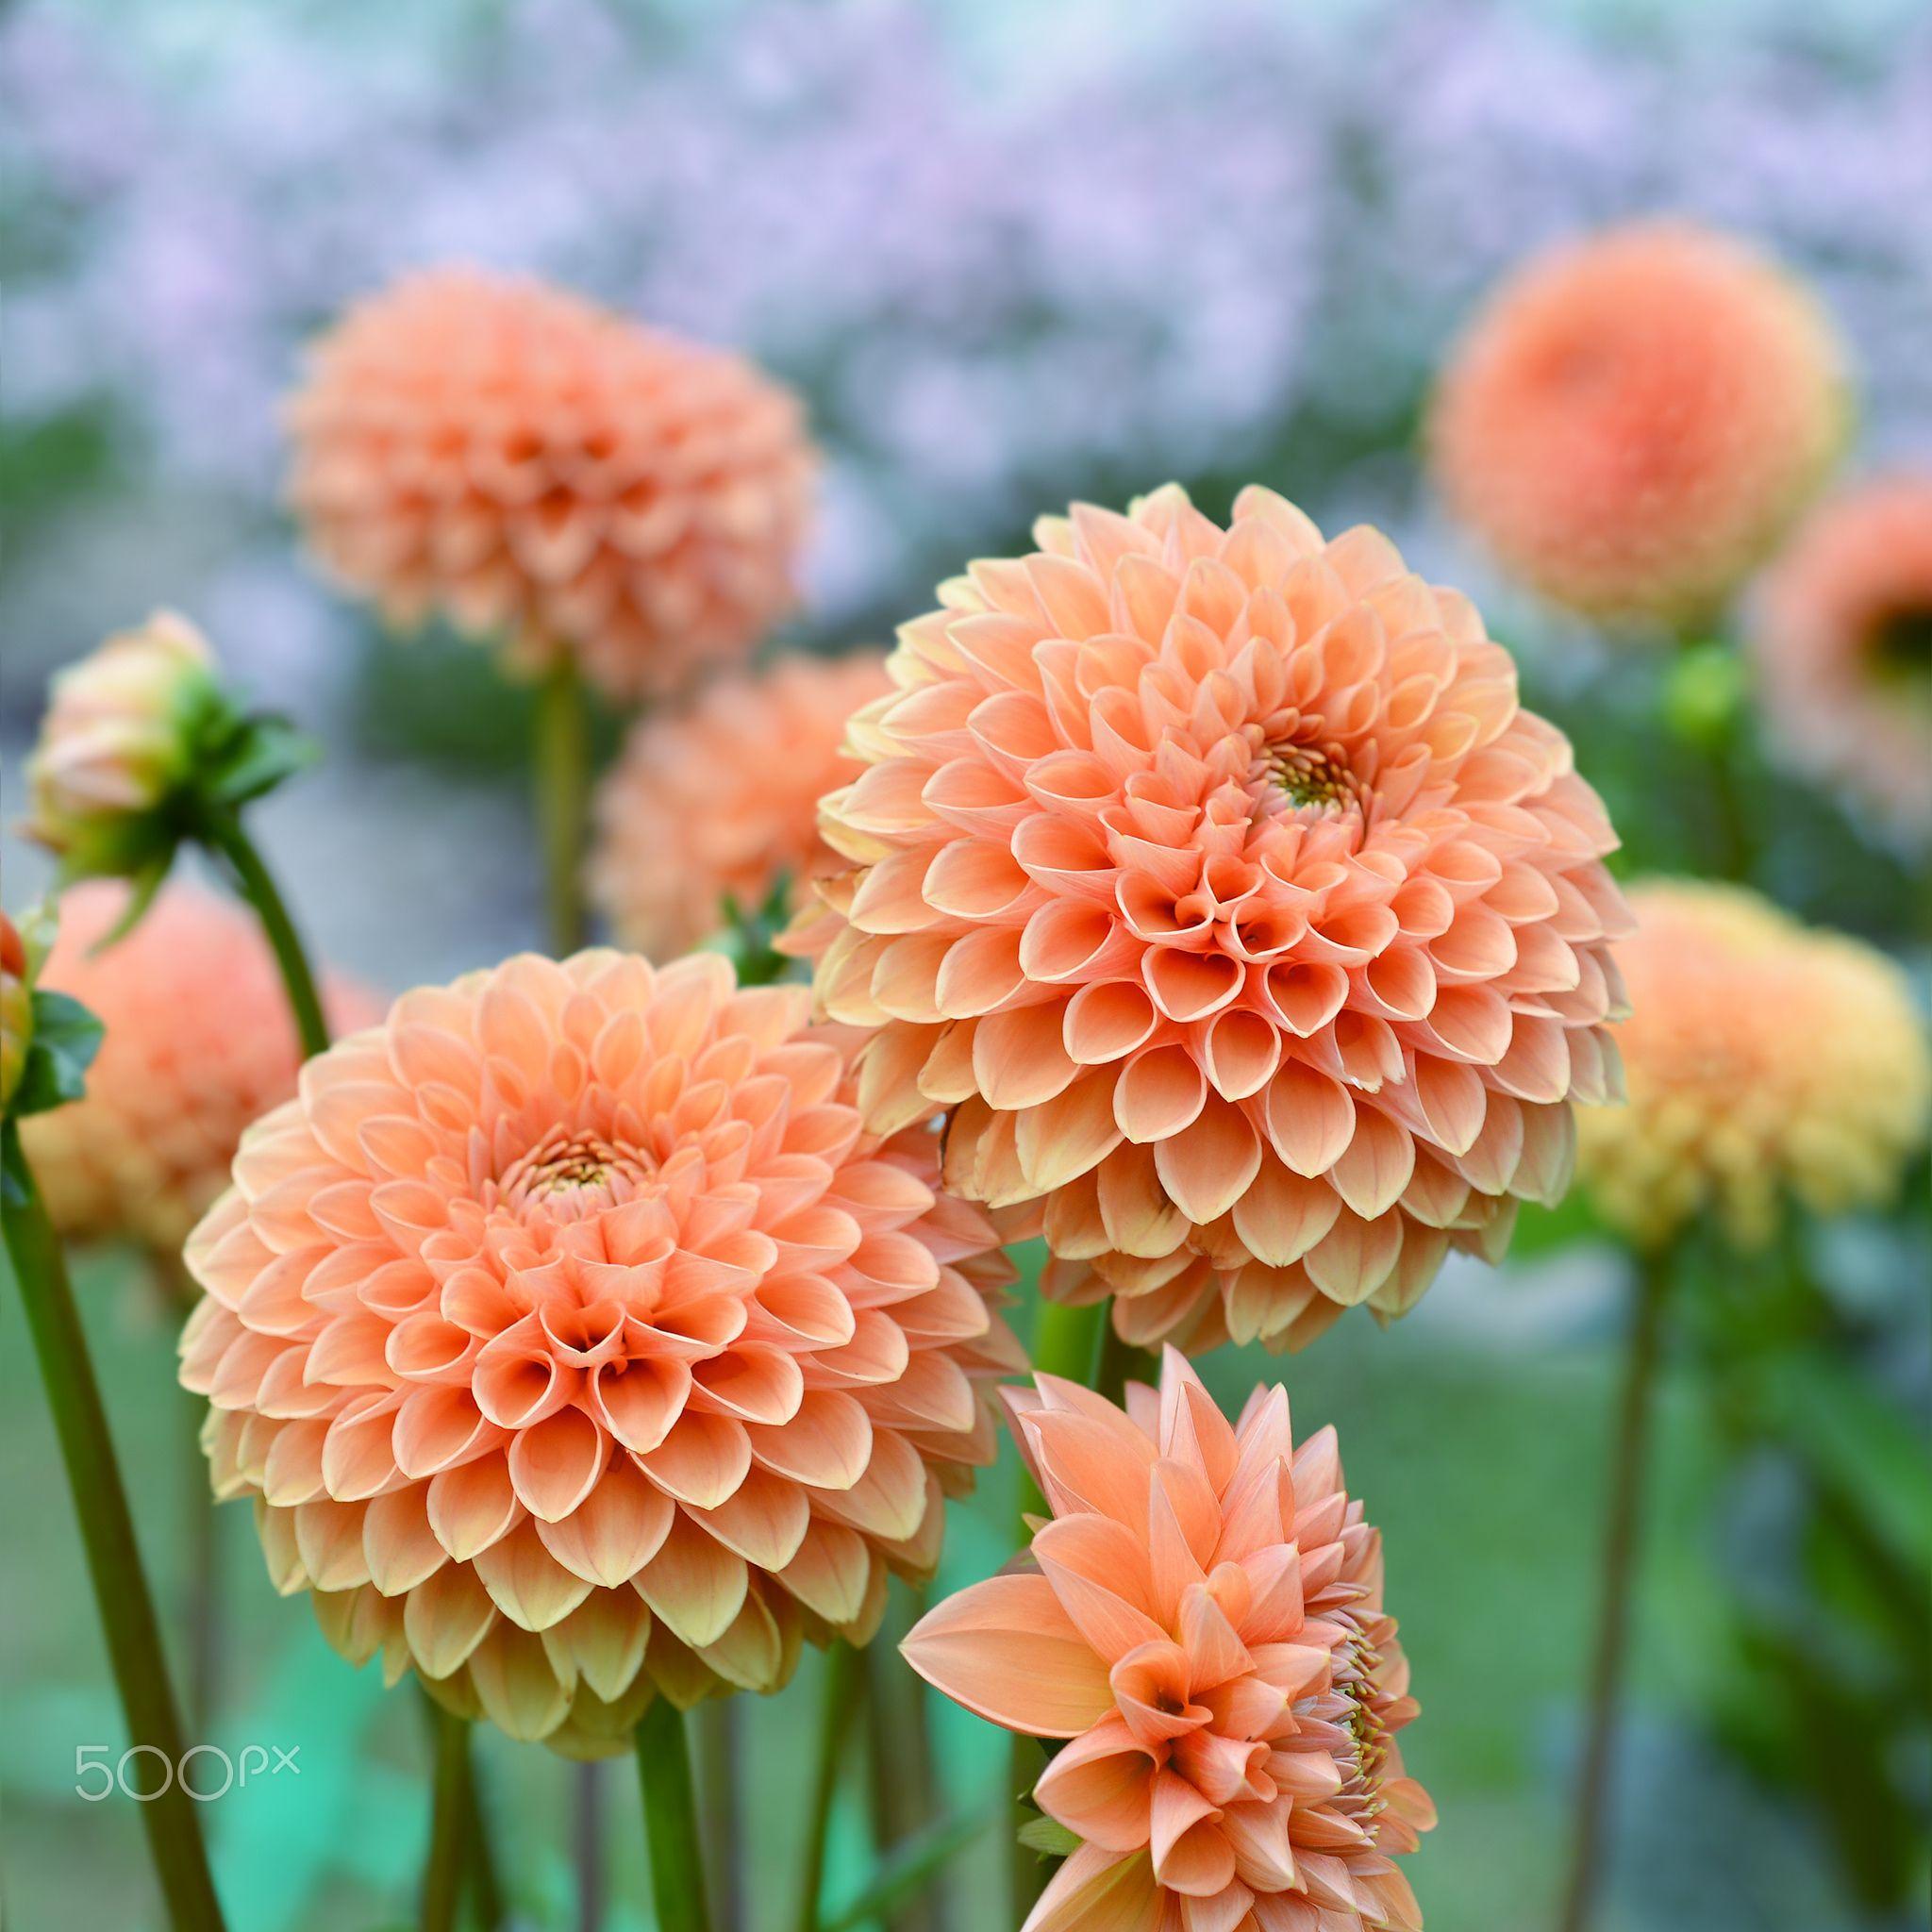 Flowers Orange Dahlia Null Delightful Dahlias Pinterest